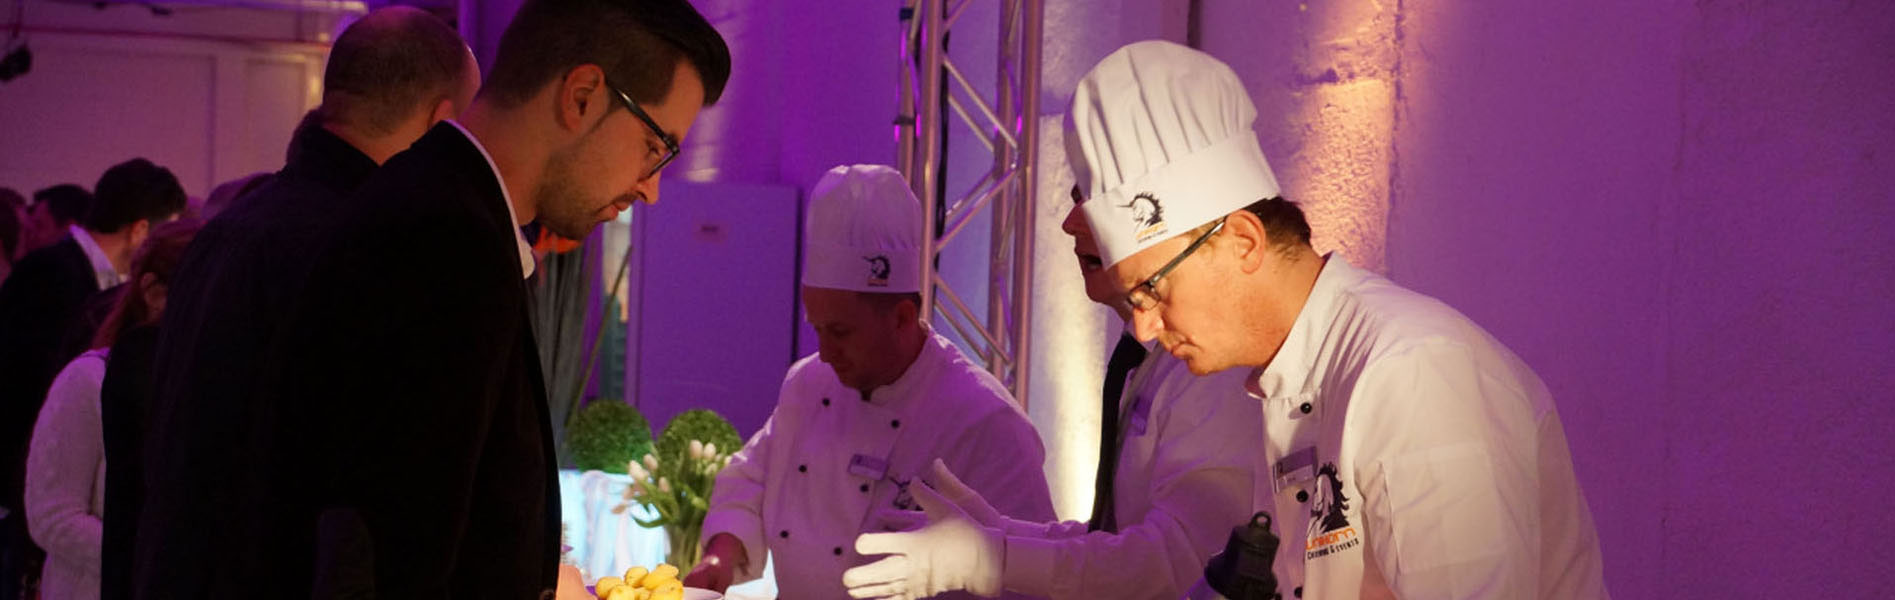 Buffet München - Unikorn Catering & Events